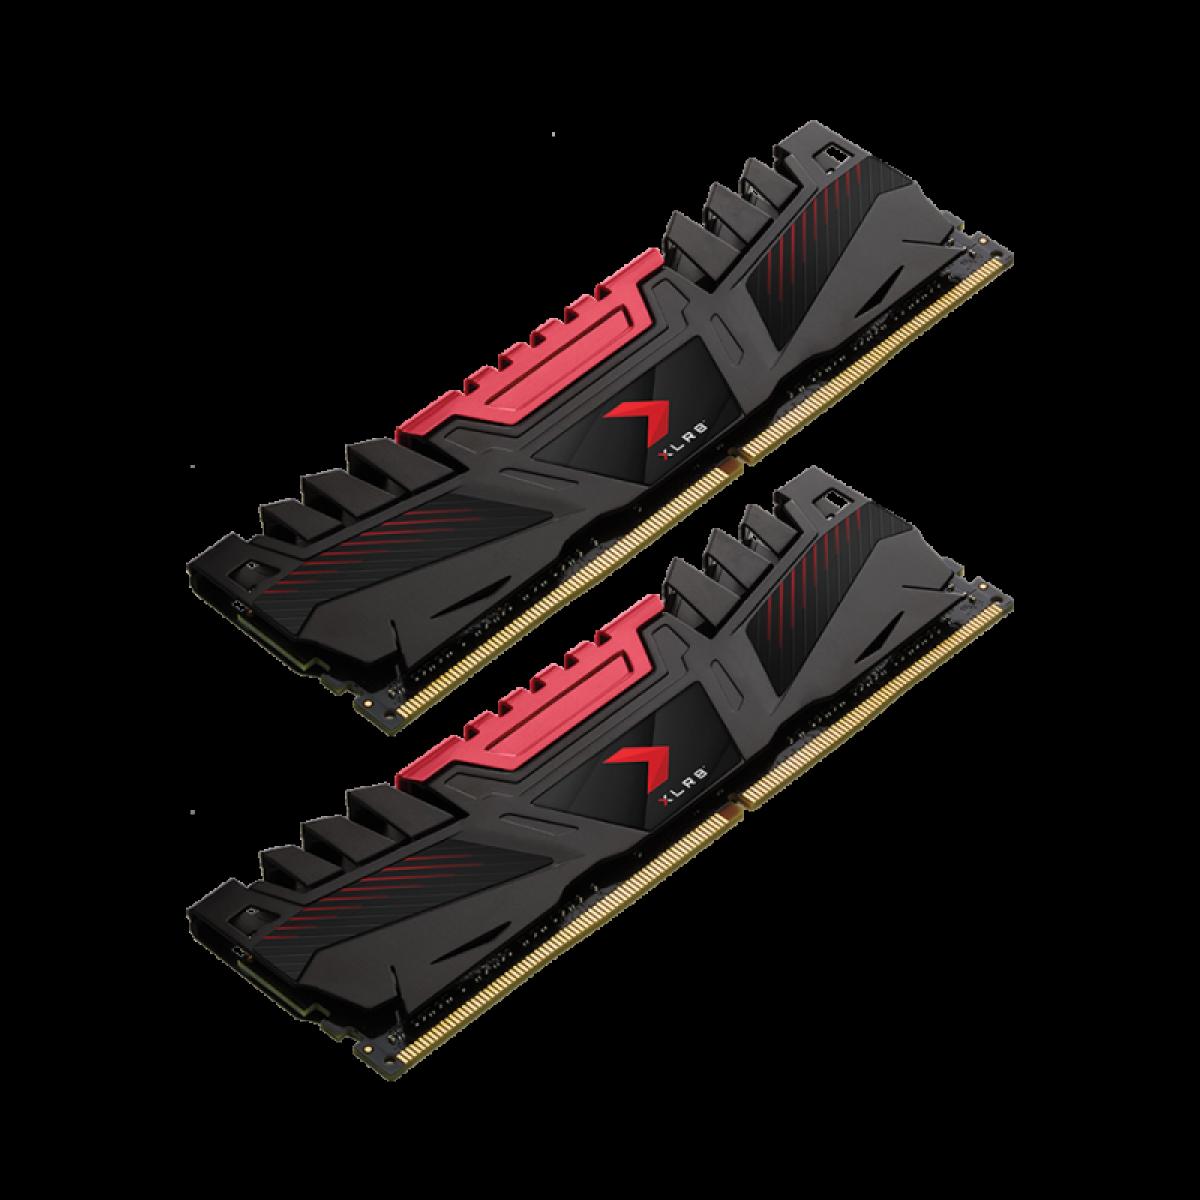 Memória DDR4 PNY XLR8 Gaming, 16GB (2x8GB), 3200MHZ, MD16GK2D4320016AXR